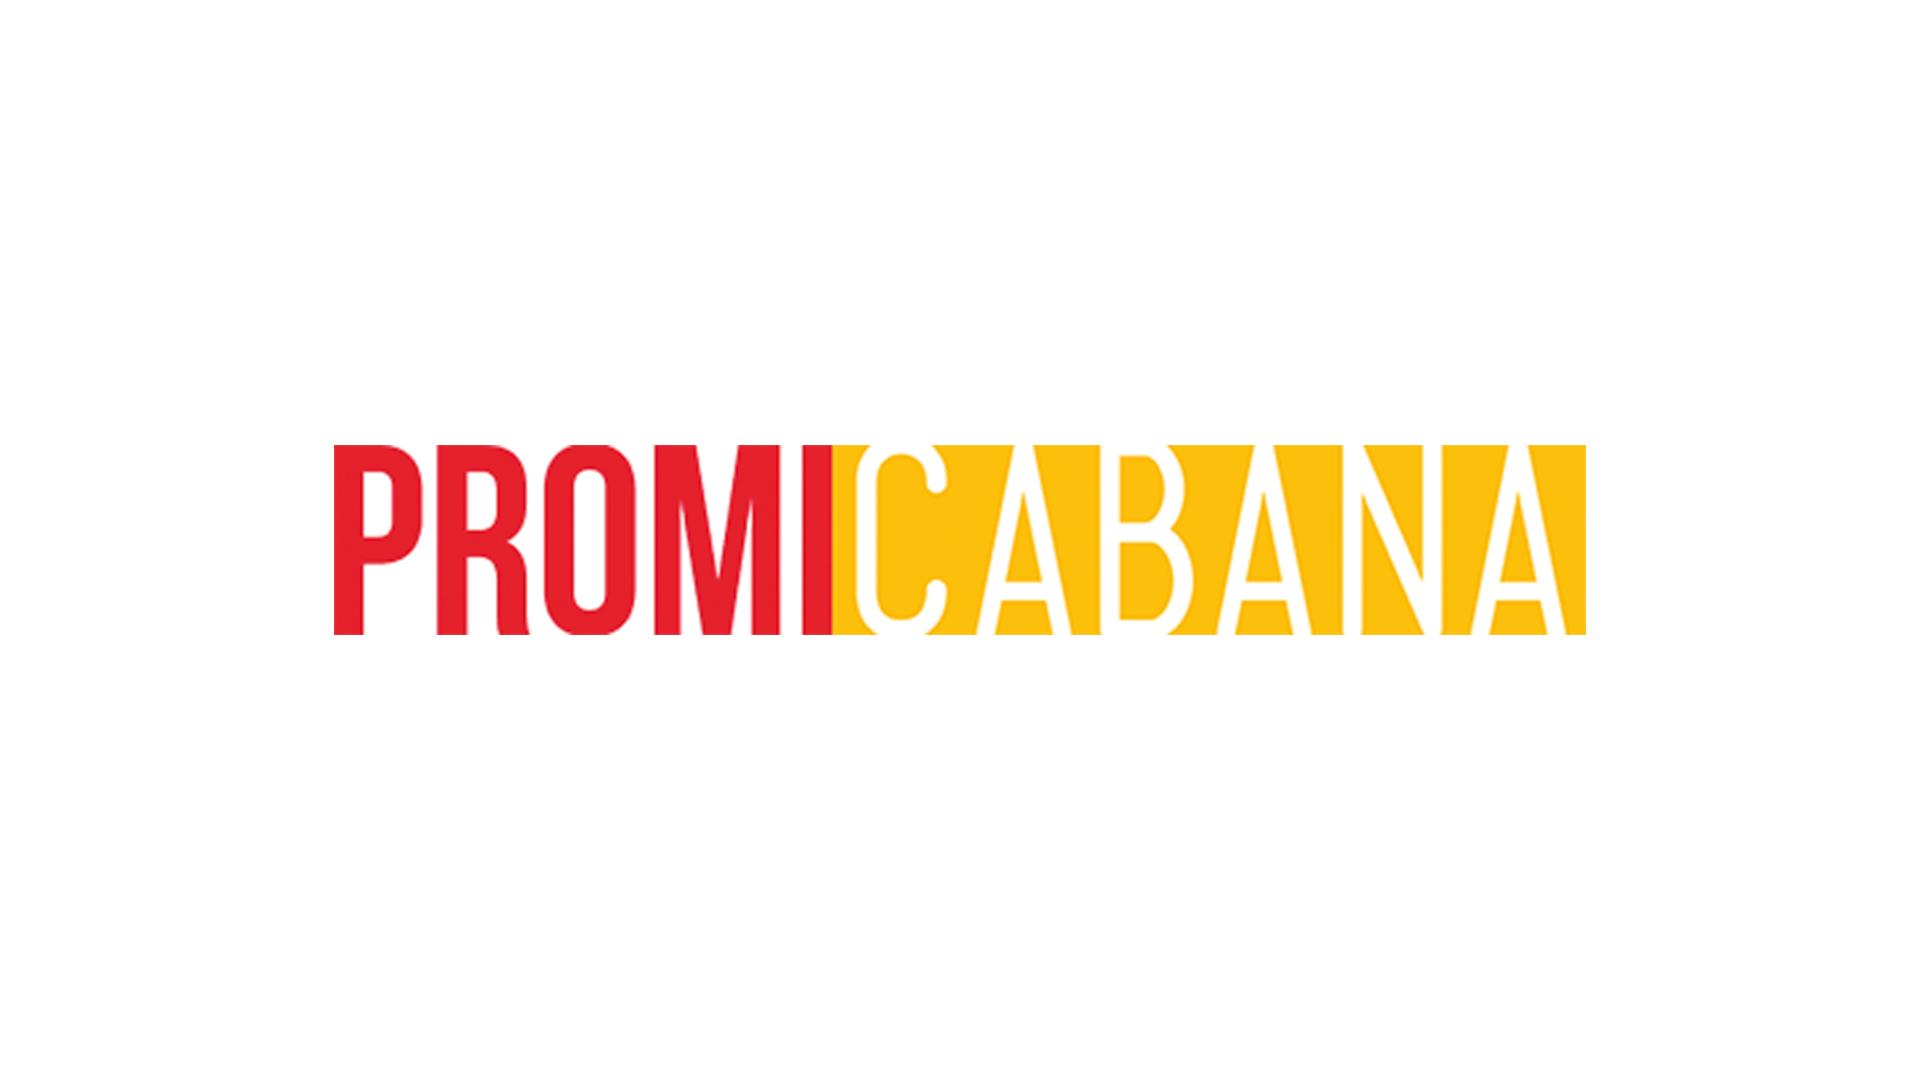 Milo-Ventimiglia-This-Is-Us-Fan-Dreharbeiten